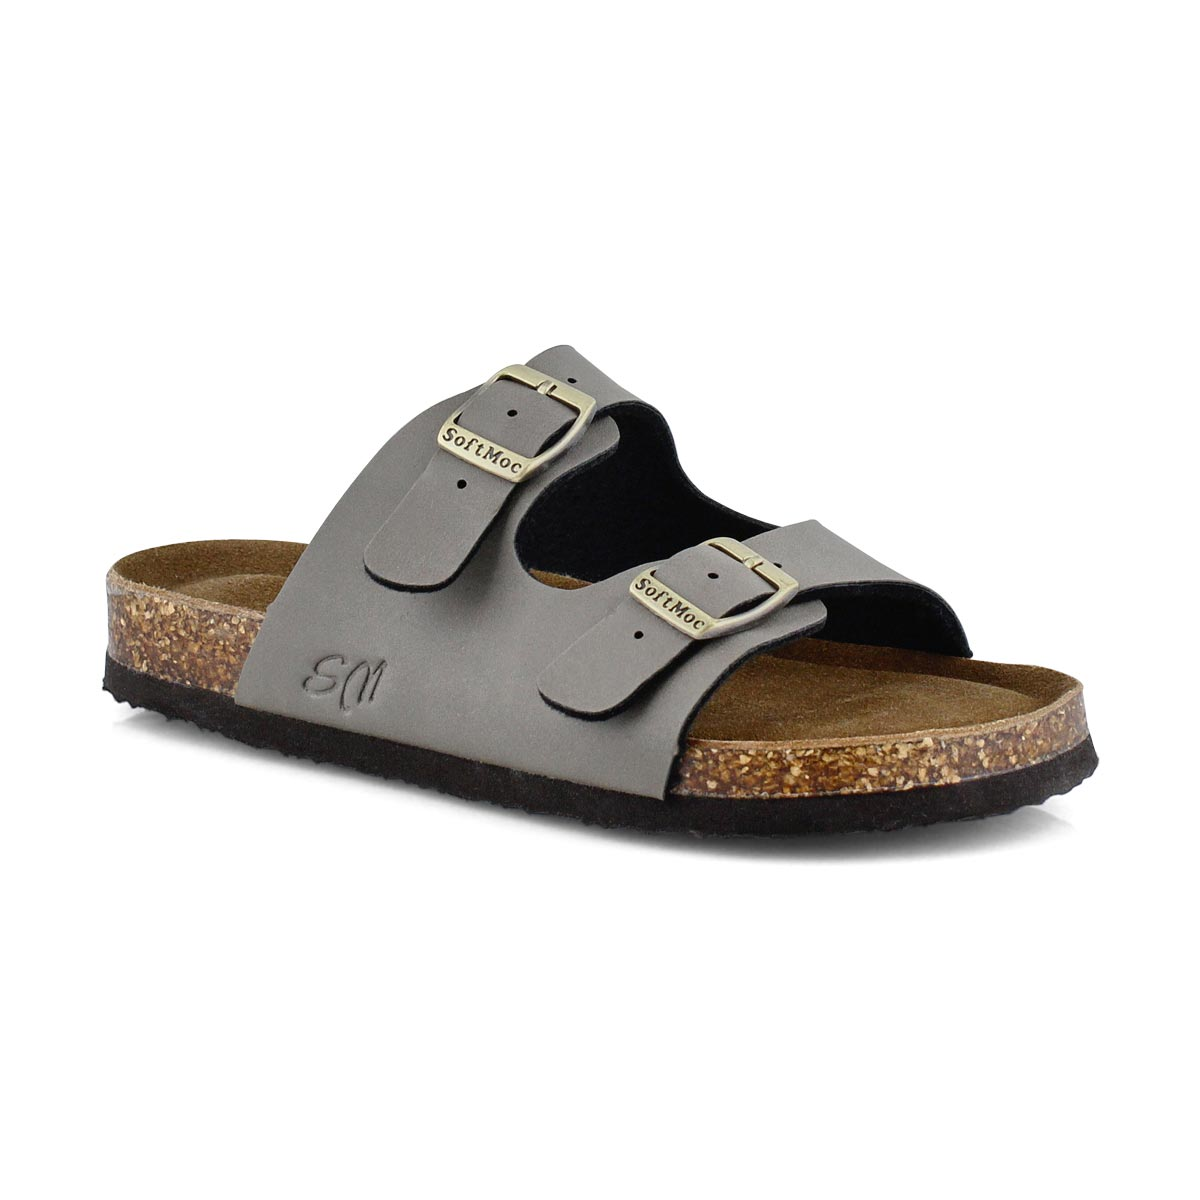 Kds Alberta 6 tpe crz memory foam sandal